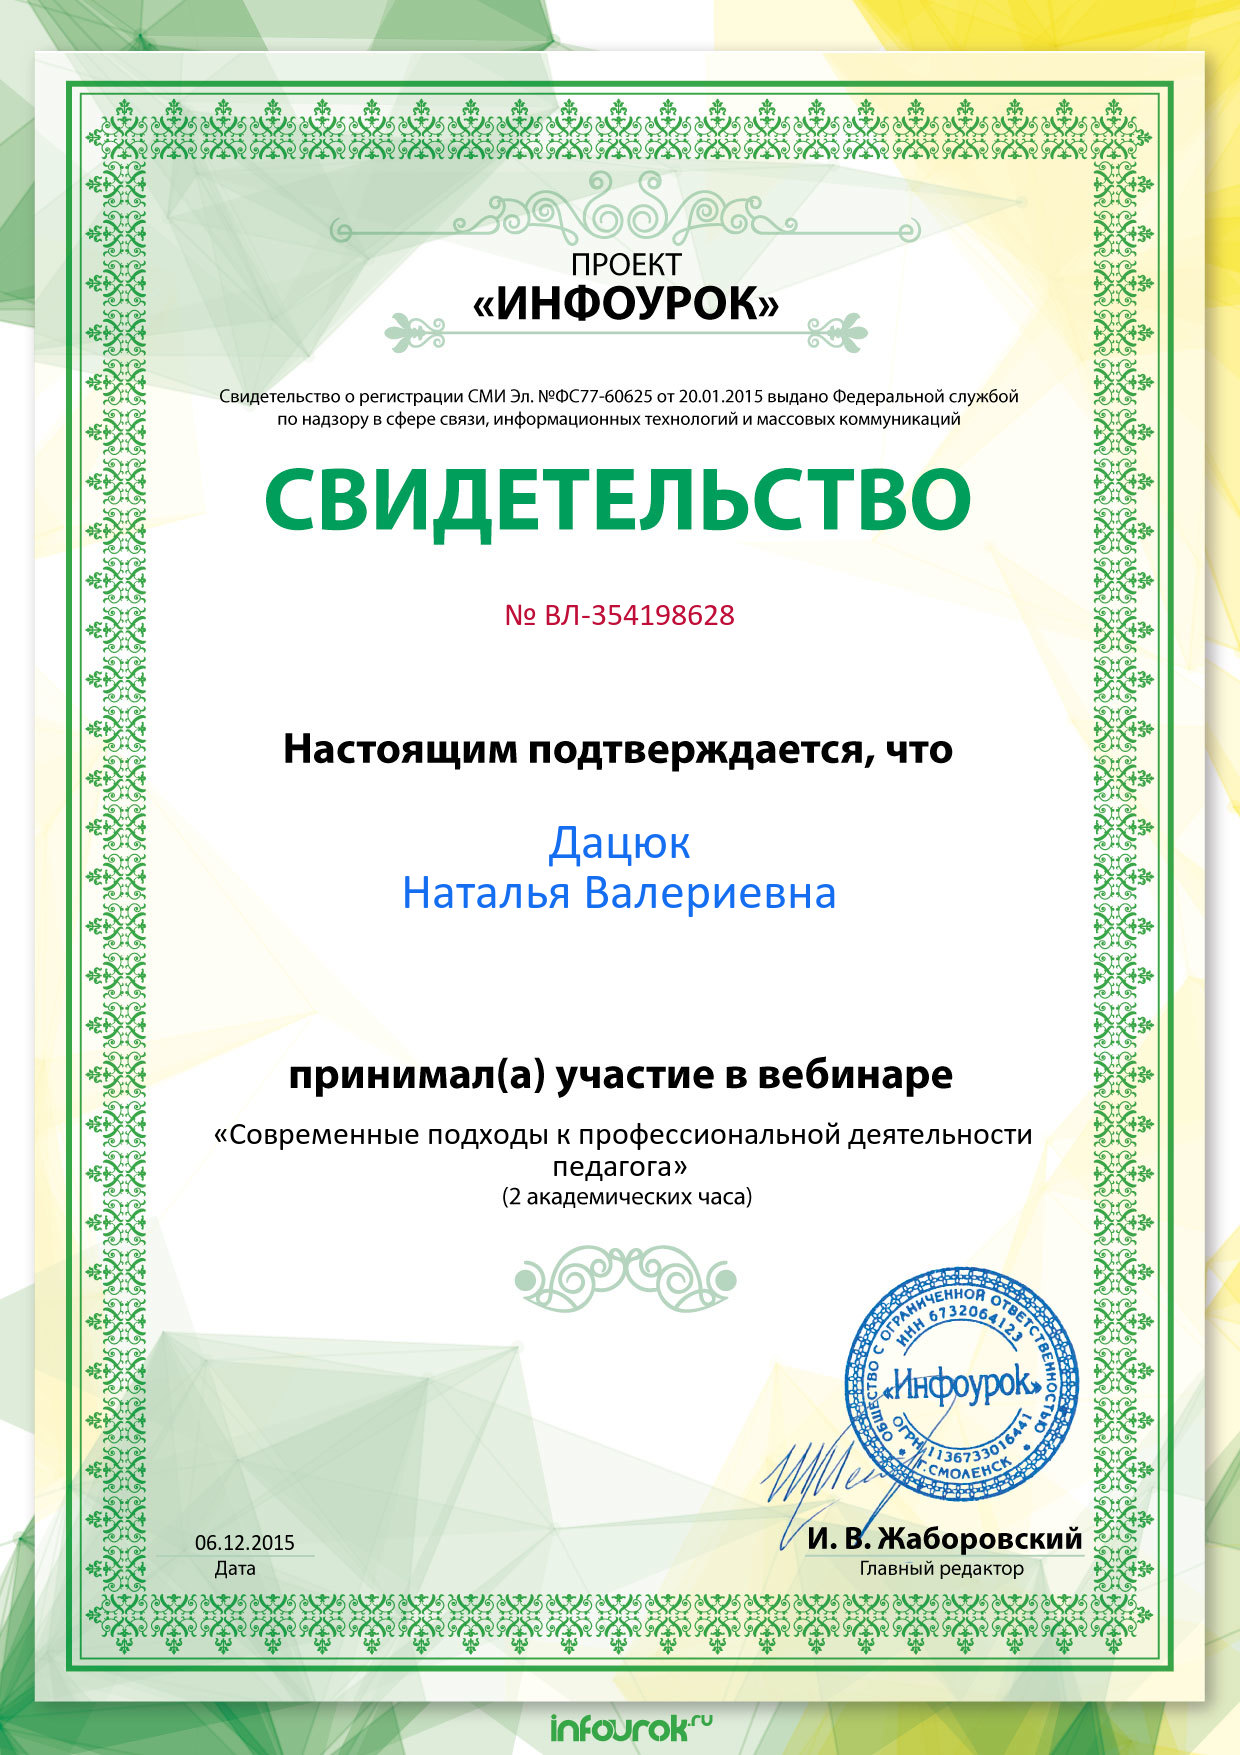 C:\Users\COMPP\Downloads\Свидетельство проекта infourok.ru № ВЛ-354198628 (1).jpg